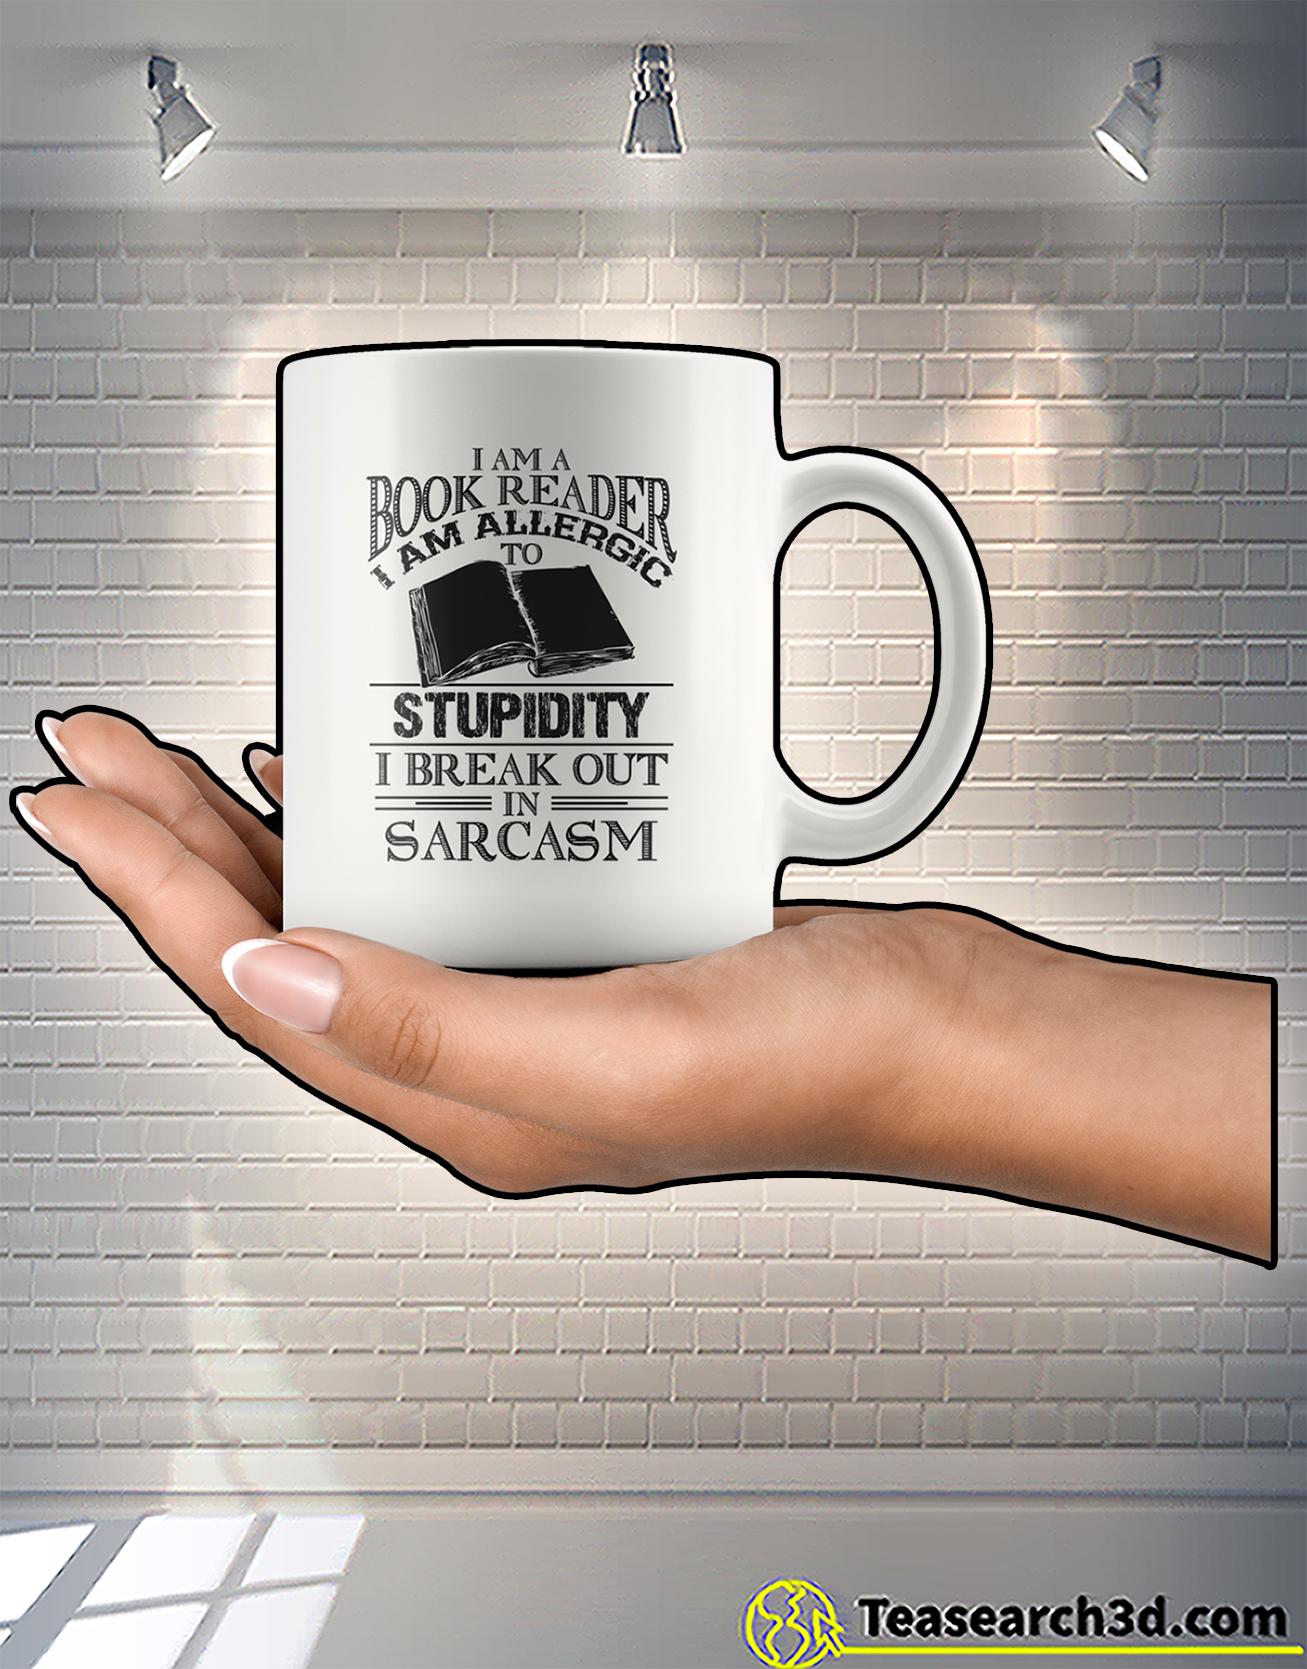 I am a book reader I am allergic to stupidity I break out in sarcasm mug 2